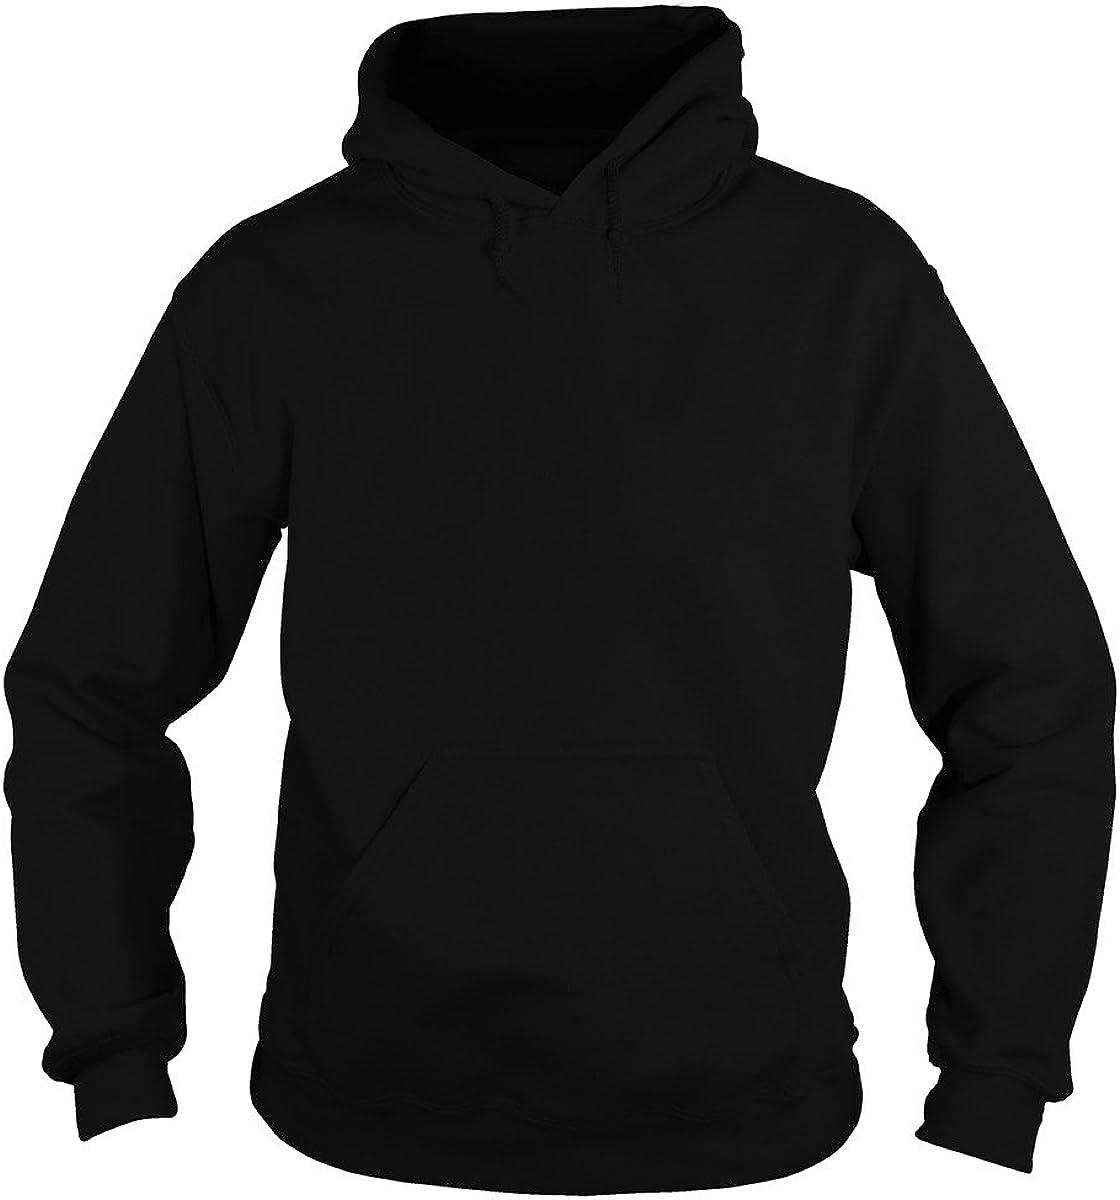 Lineman American Flag for A Lineworker Adult Hooded Sweatshirt